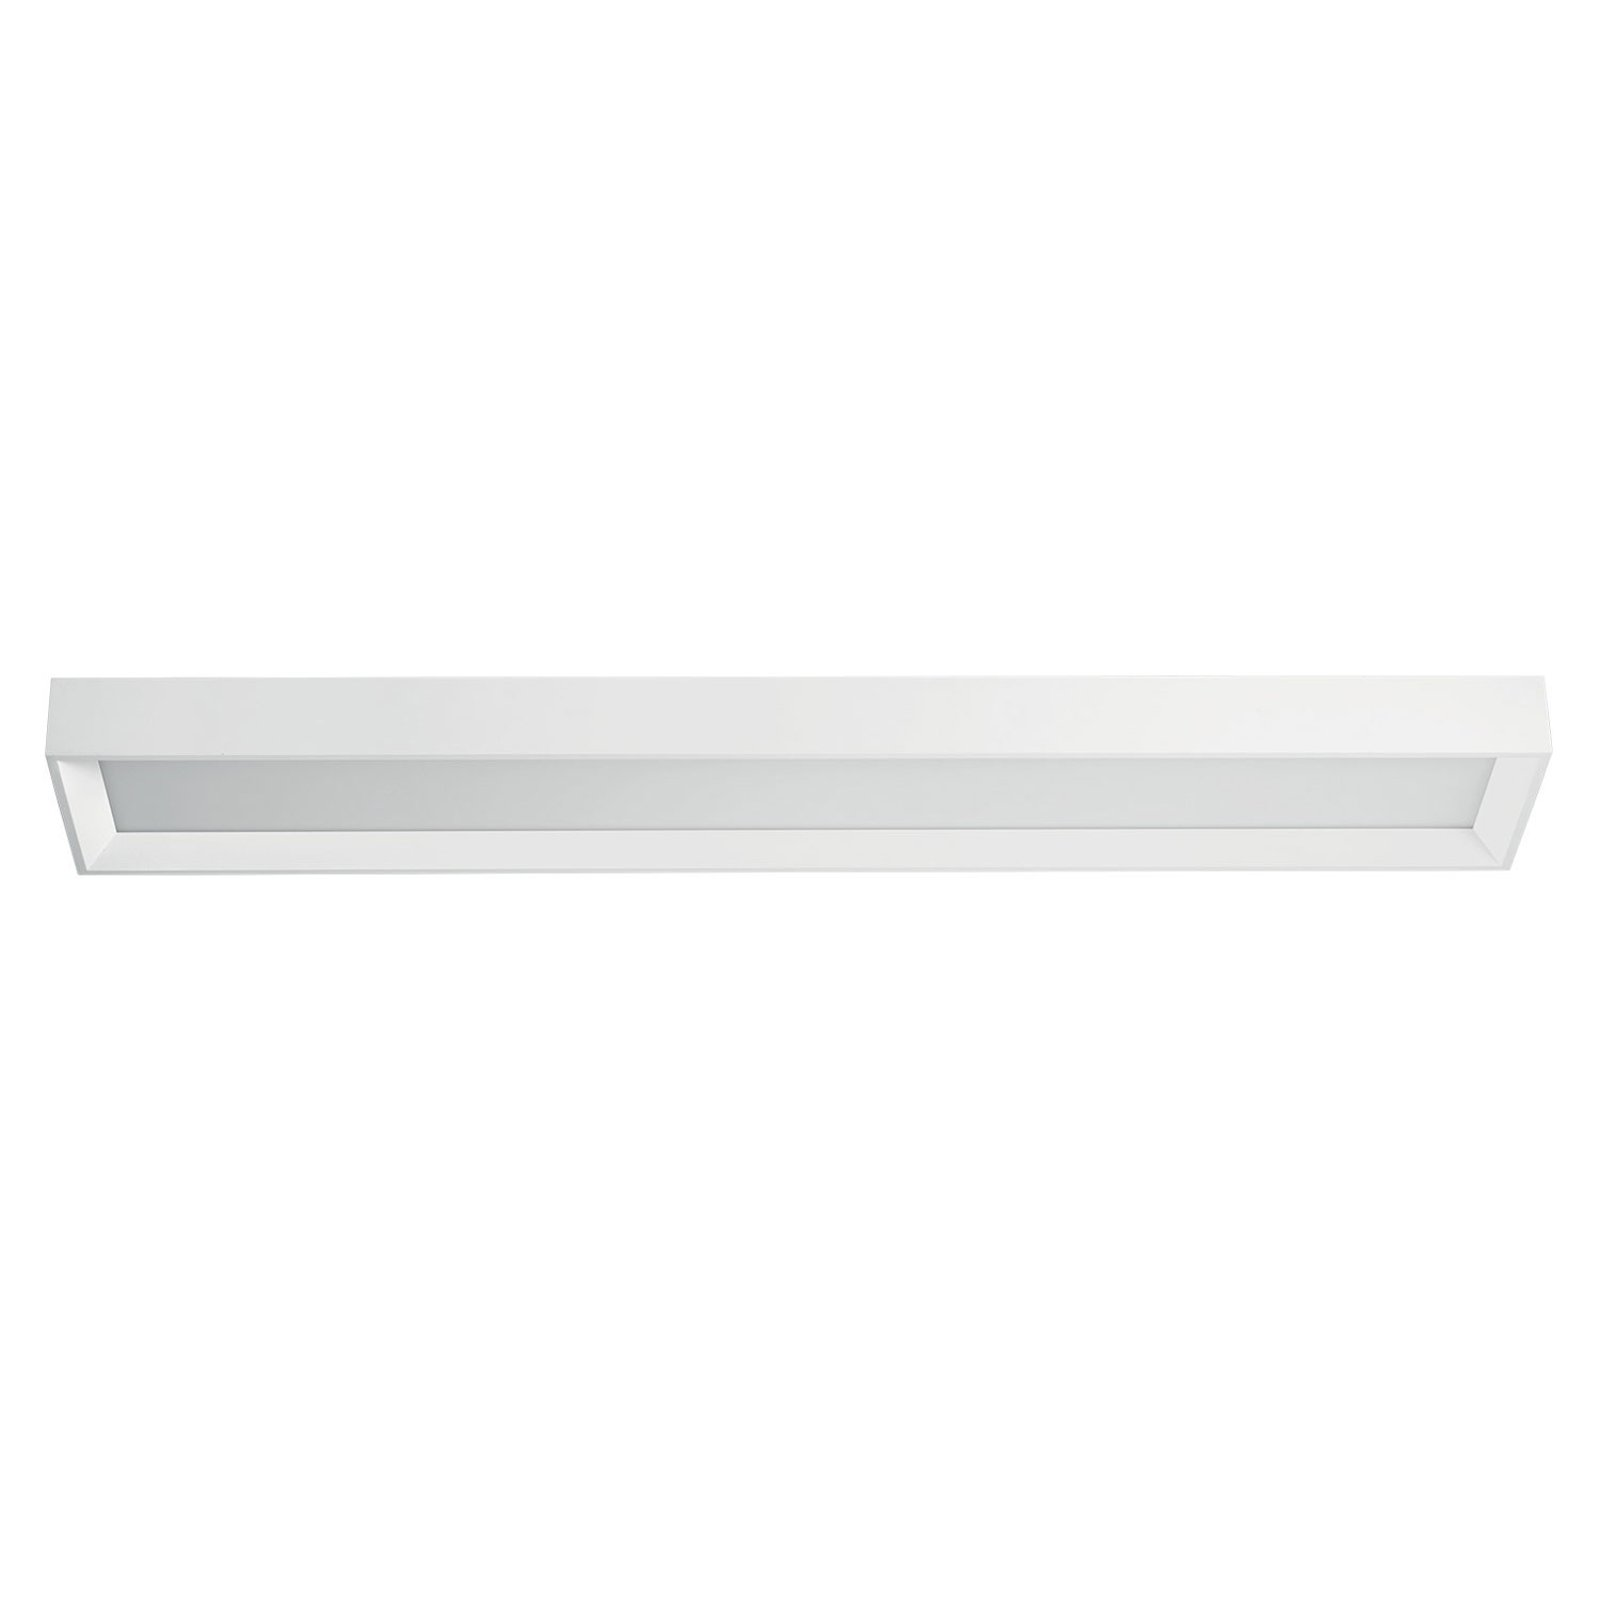 Tara LED-taklampe dimbar, 109 x 19 cm